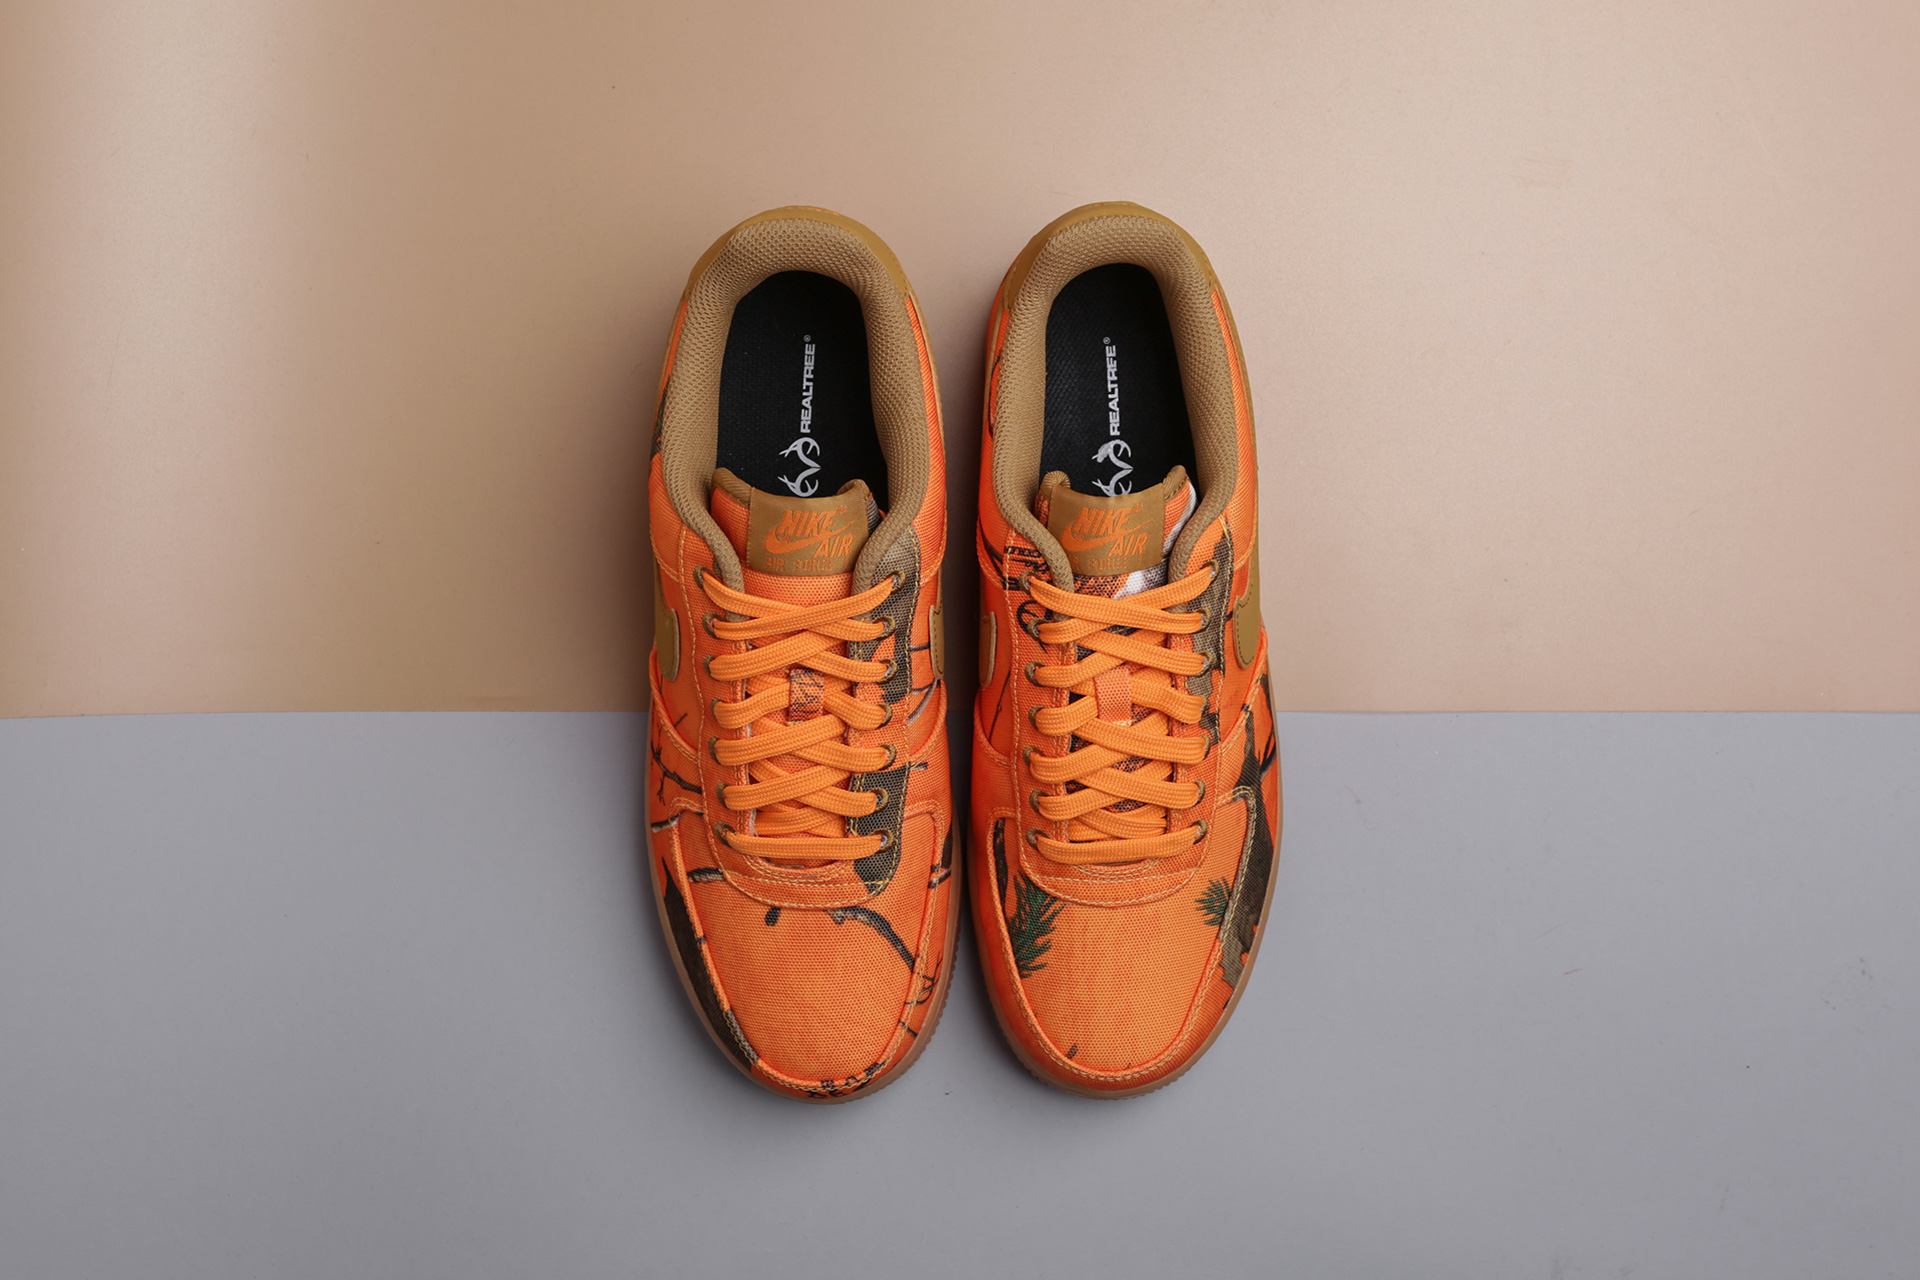 new product 9a7f7 39e9d ... Купить мужские оранжевые кроссовки Nike Air Force 1 07 LV8 3 - фото 2  картинки ...